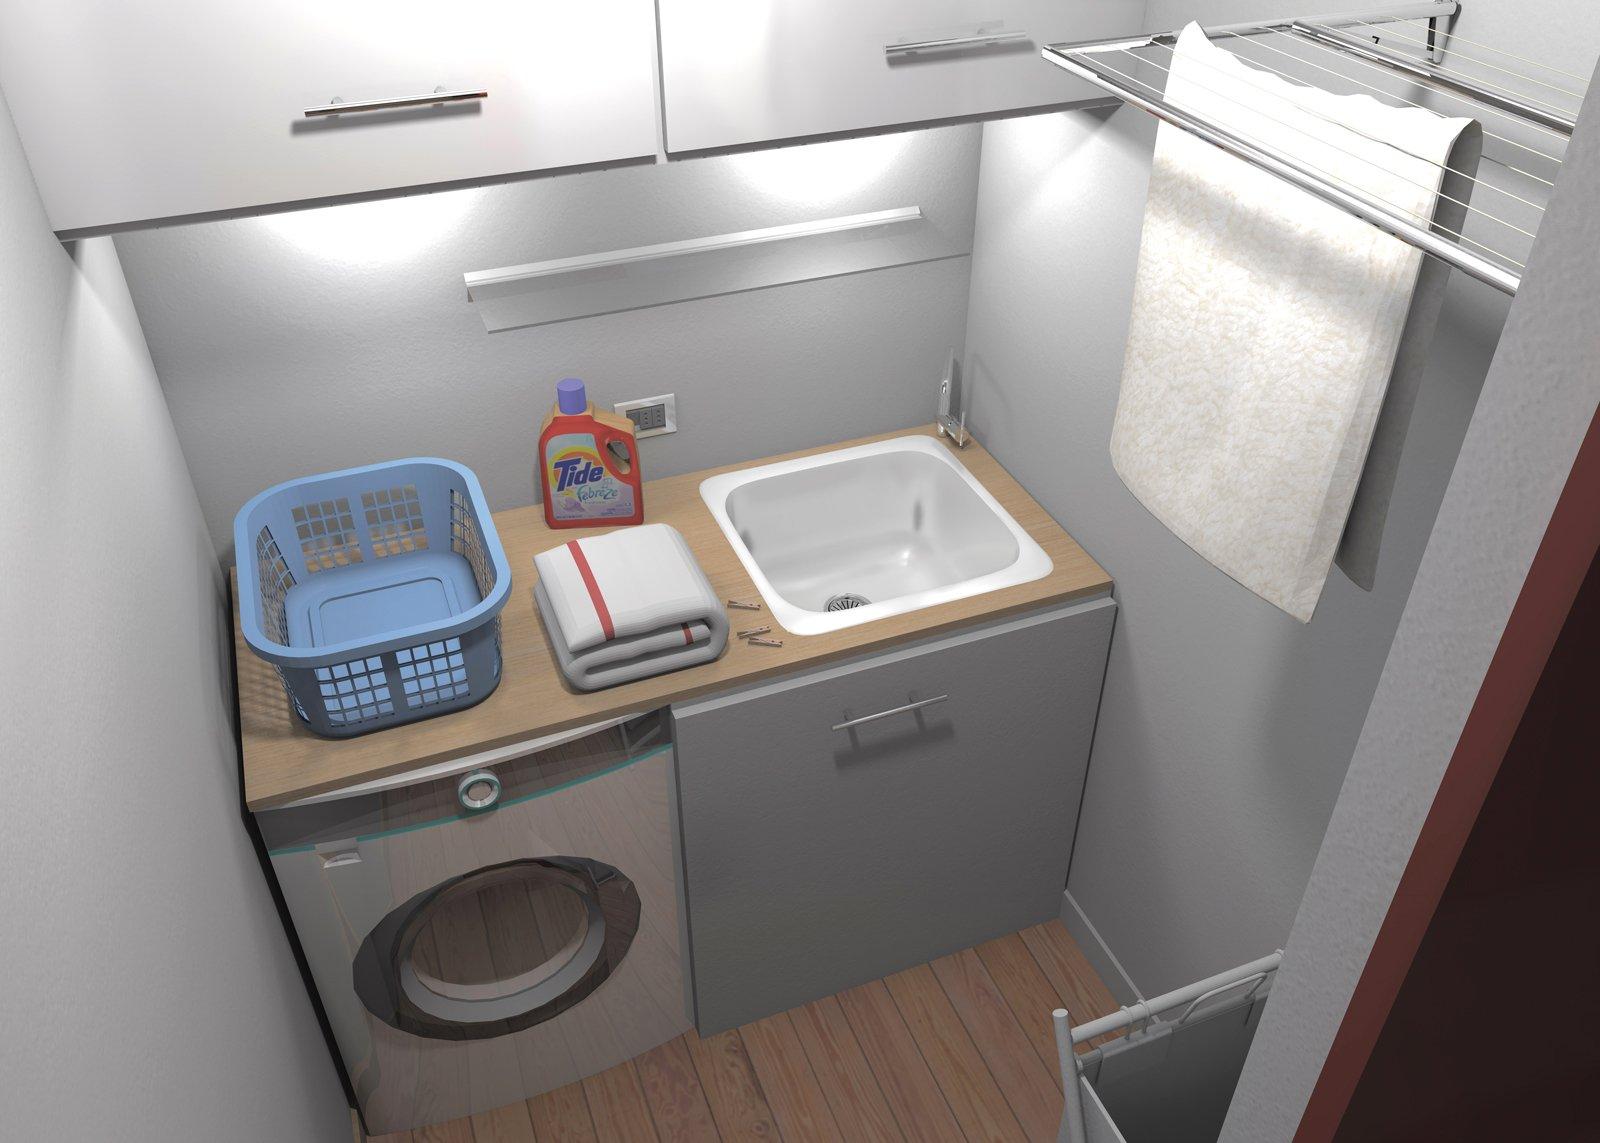 blocco7 1 la lavanderia